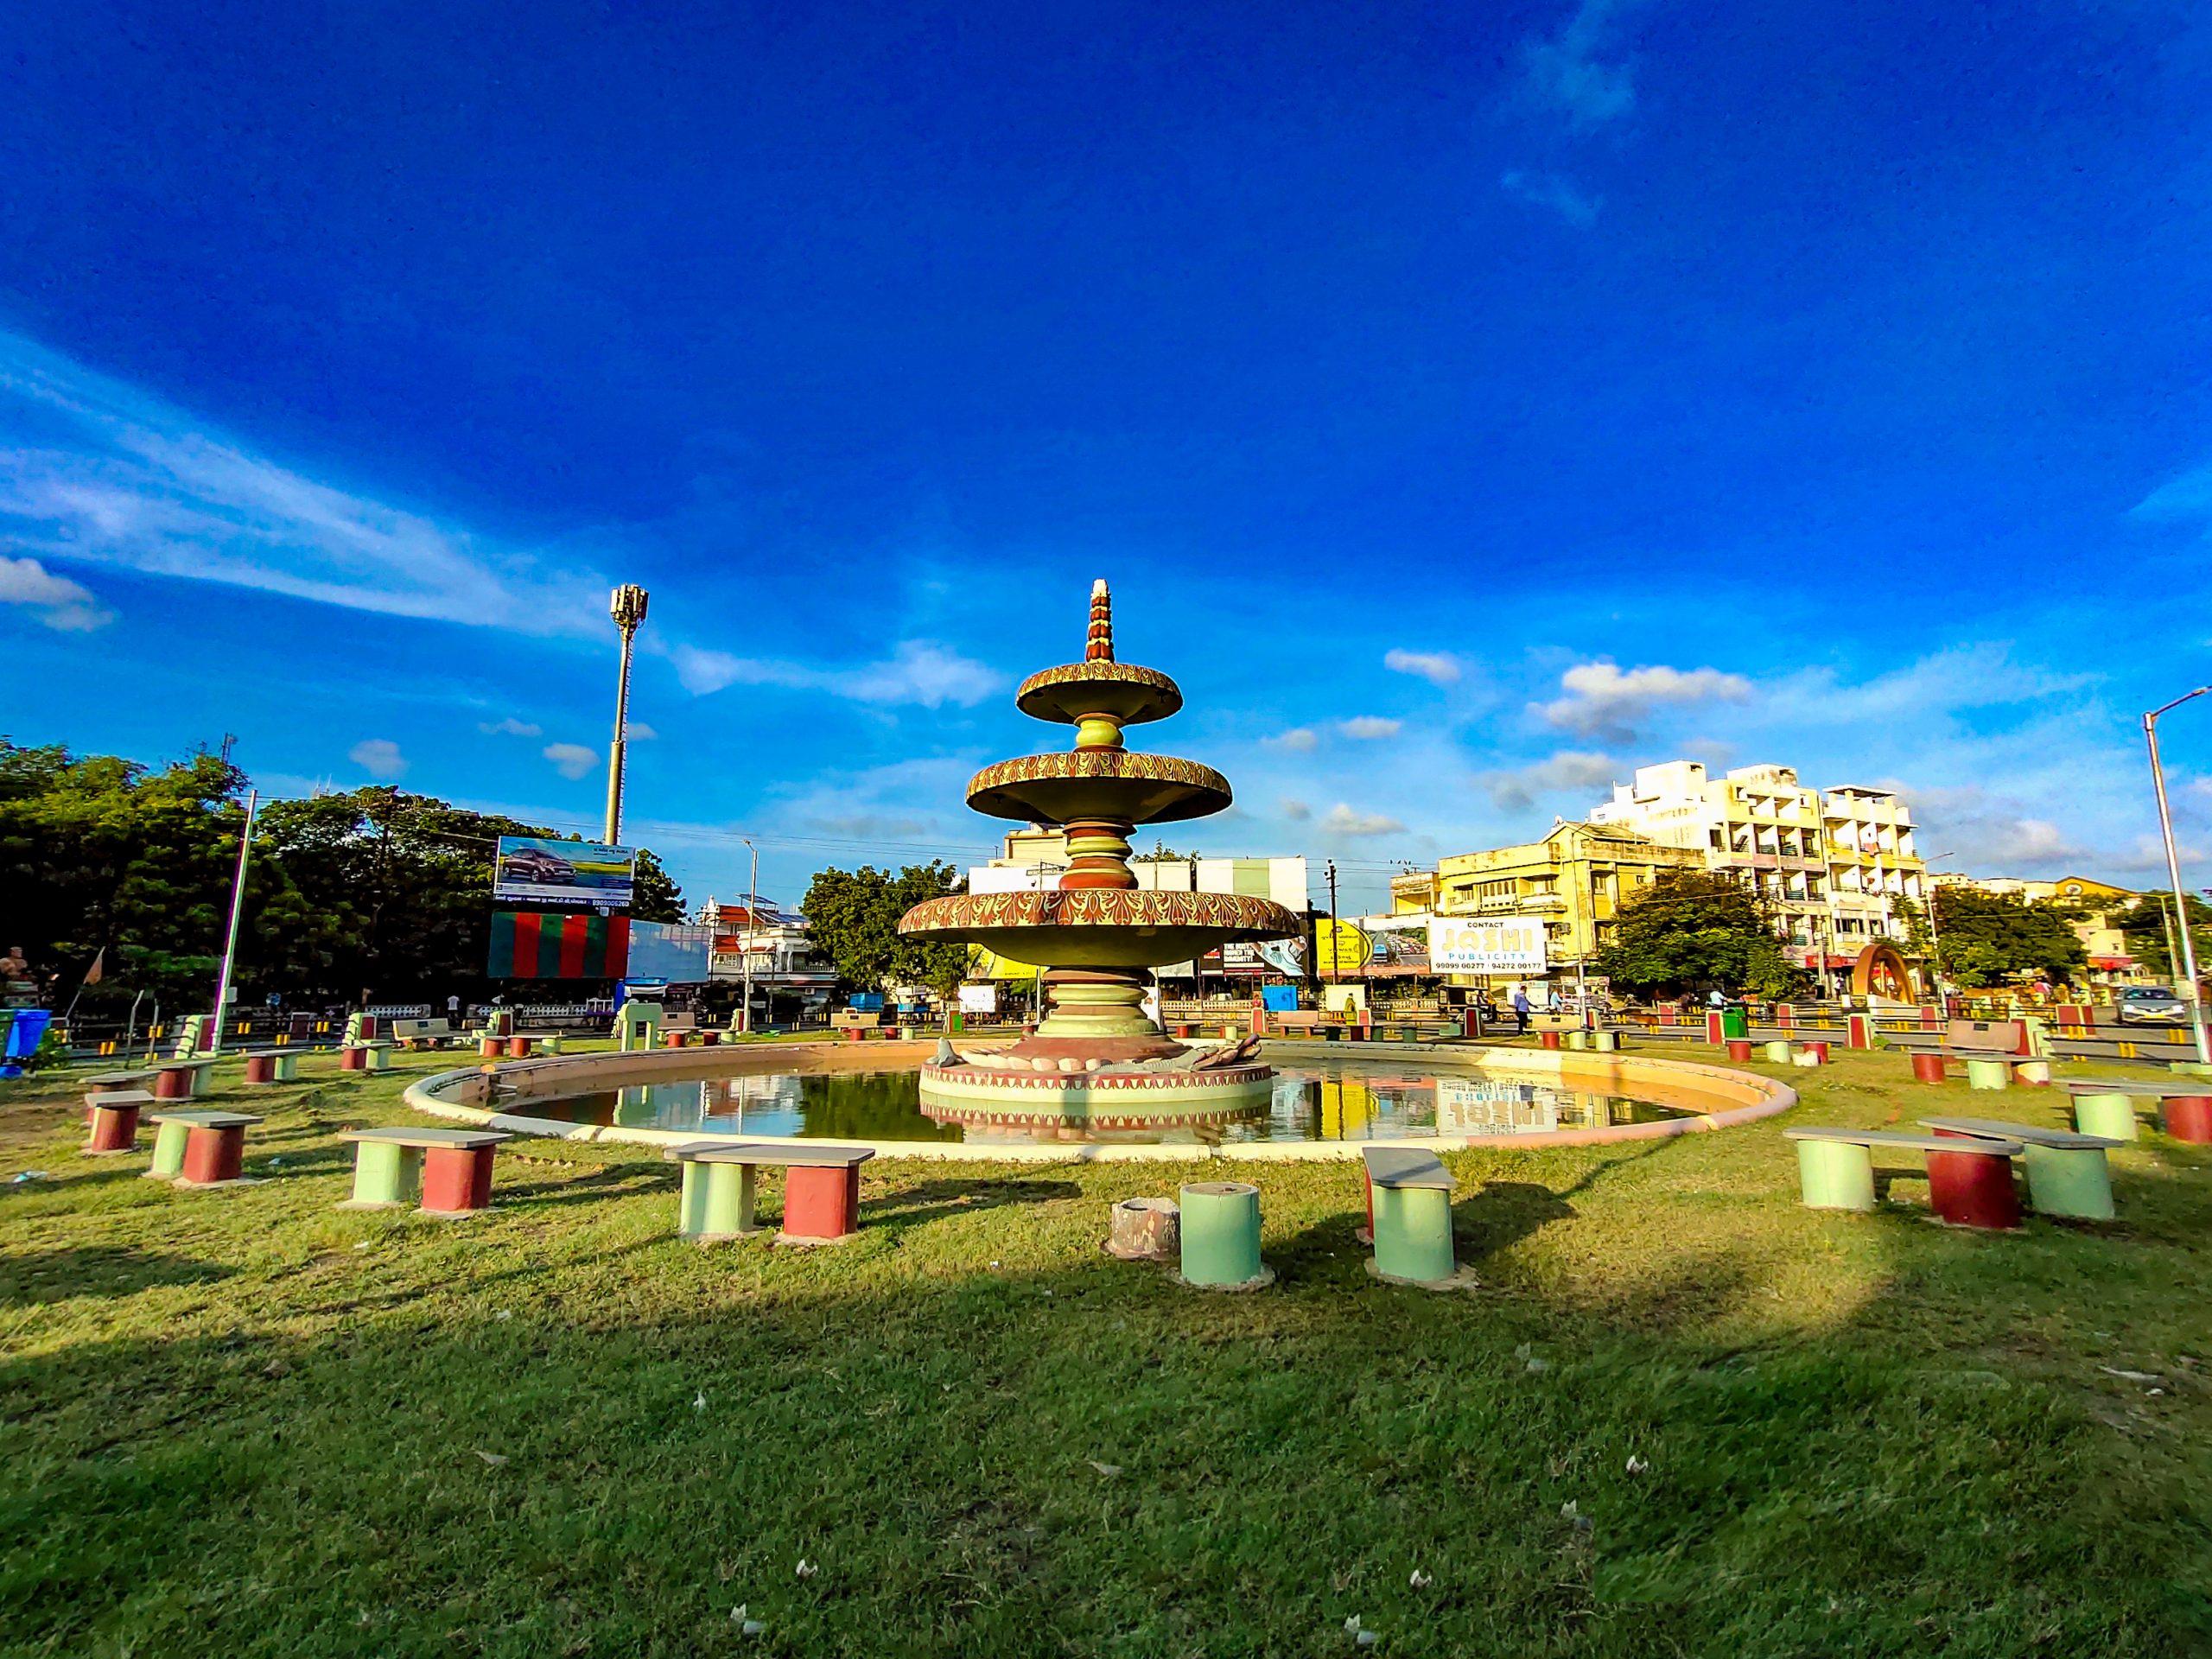 Paradise Fountain in Porbandar